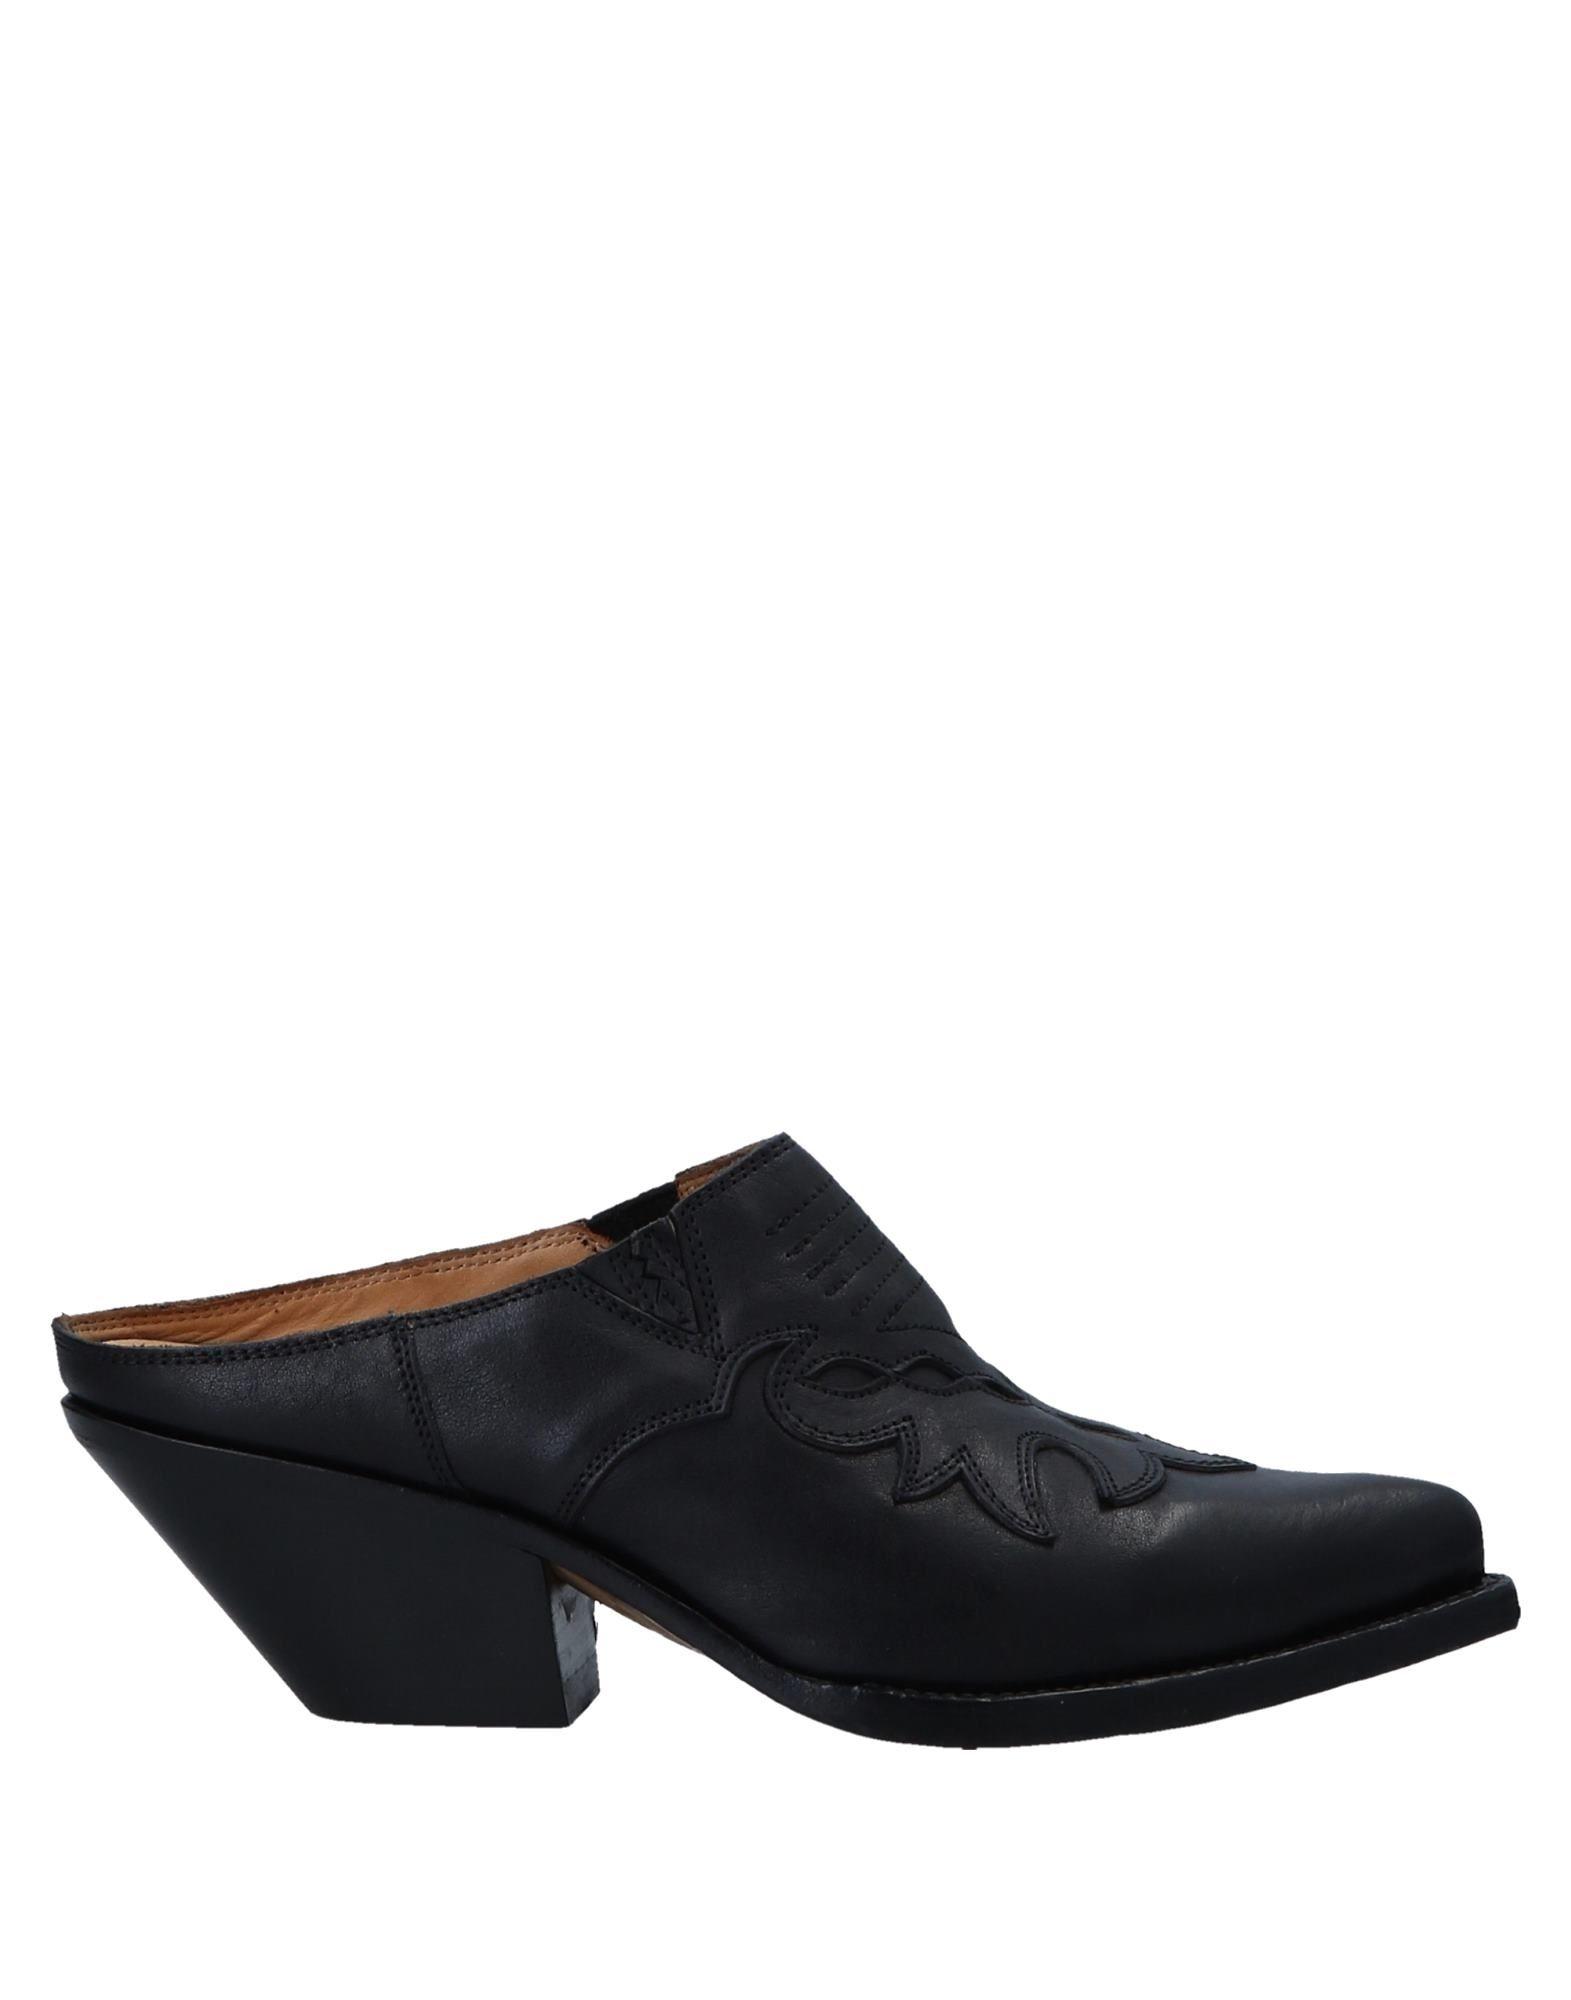 Buttero® Pantoletten Damen  11562850HBGut aussehende strapazierfähige Schuhe